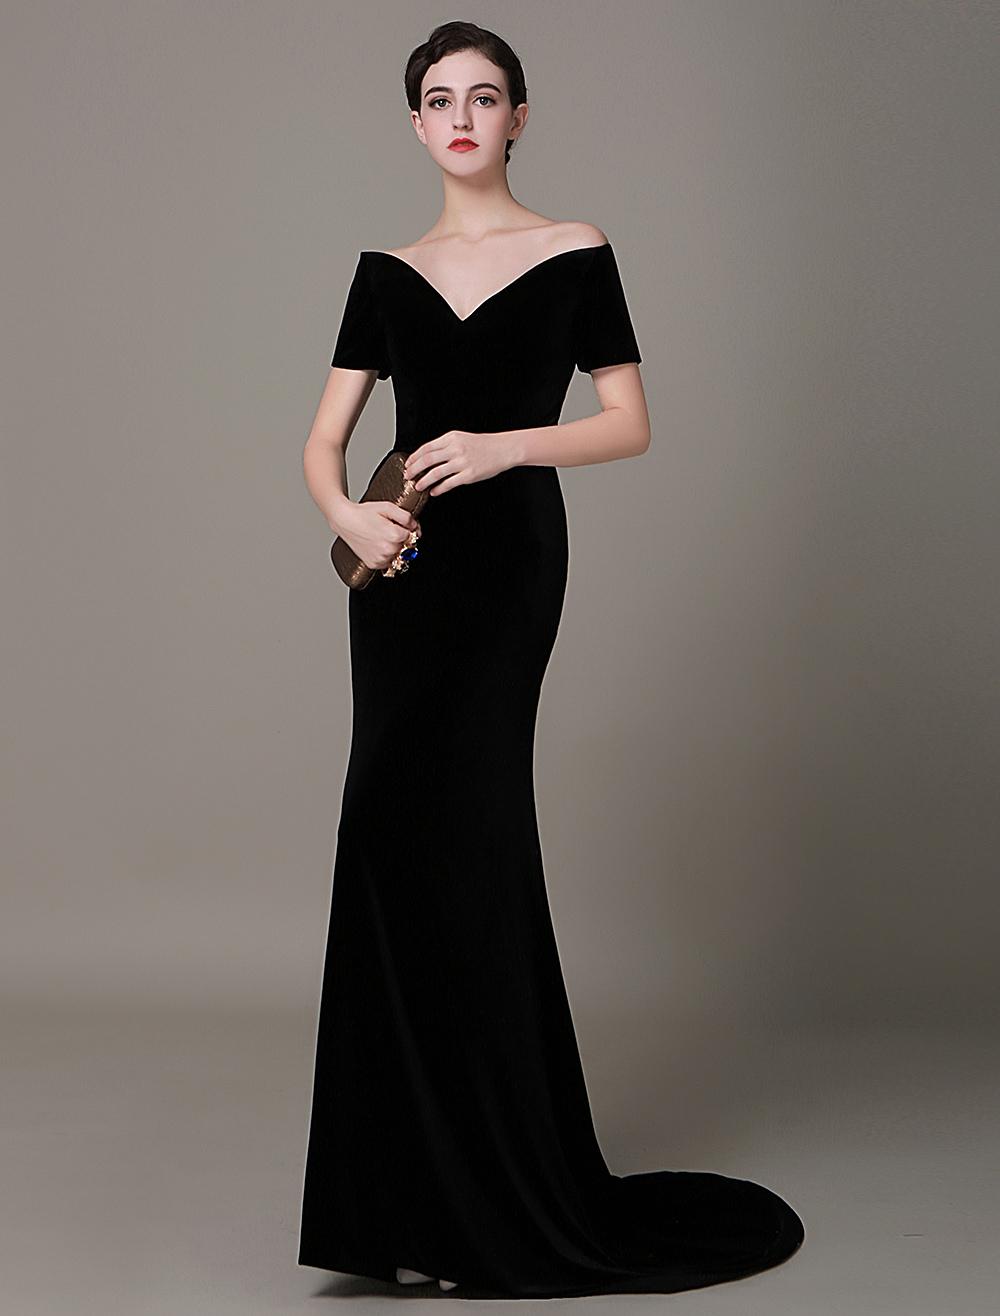 Black Prom Dresses 2018 Long Mermaid Velvet Evening Dress Vintage Lady Gaga Red Carpet Dress Milanoo (Wedding Evening Dresses) photo